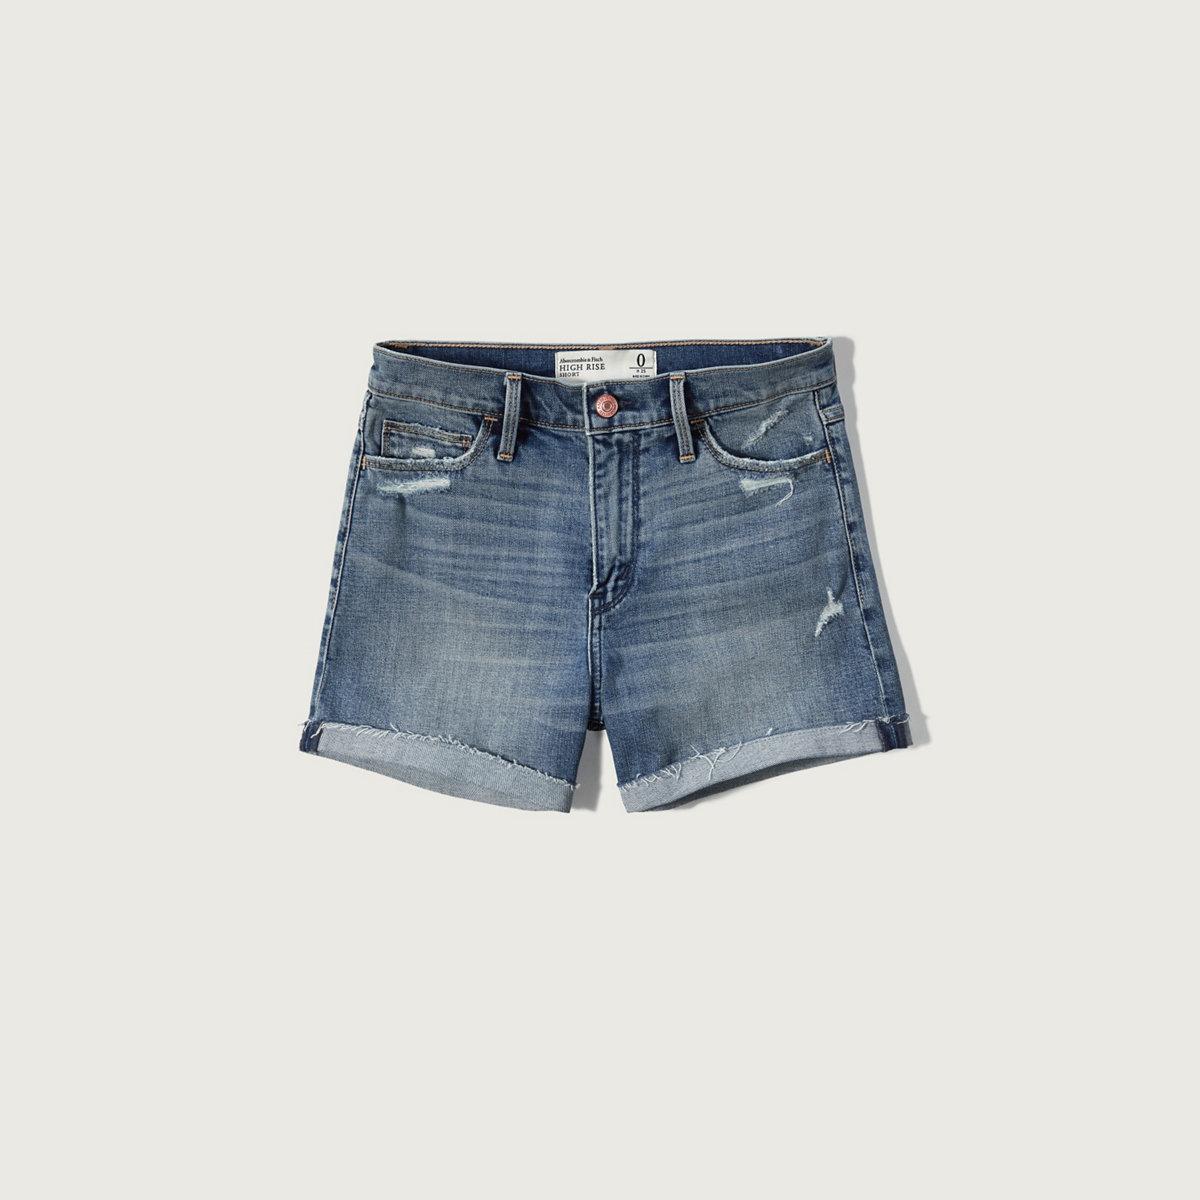 High Rise 4 Inch Shorts